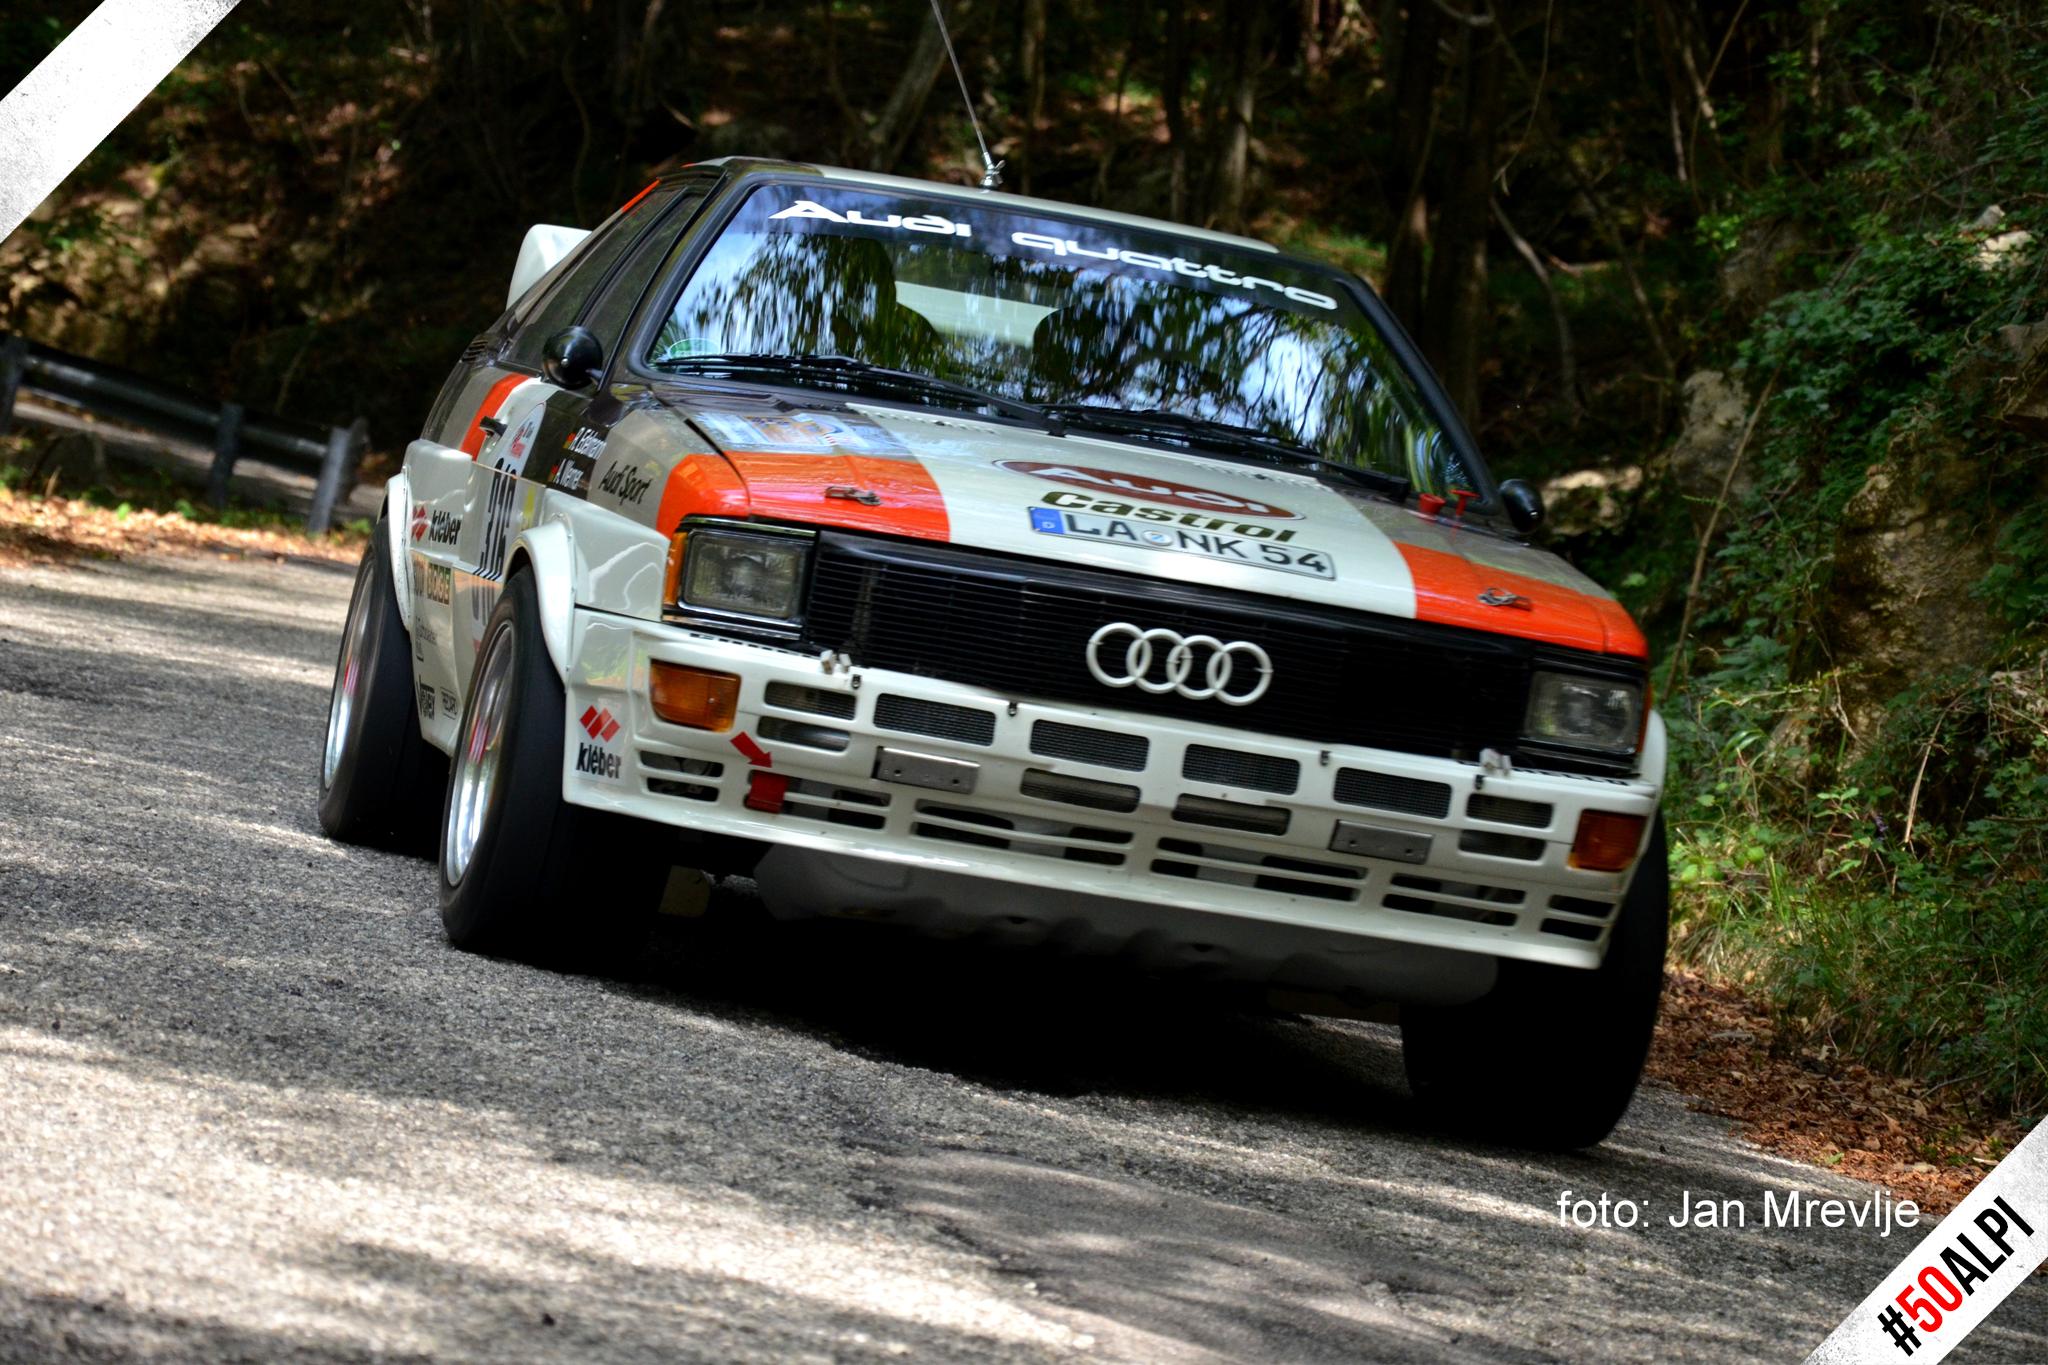 Awesome Audi Quattro at the Rally Alpi Orientali Historic